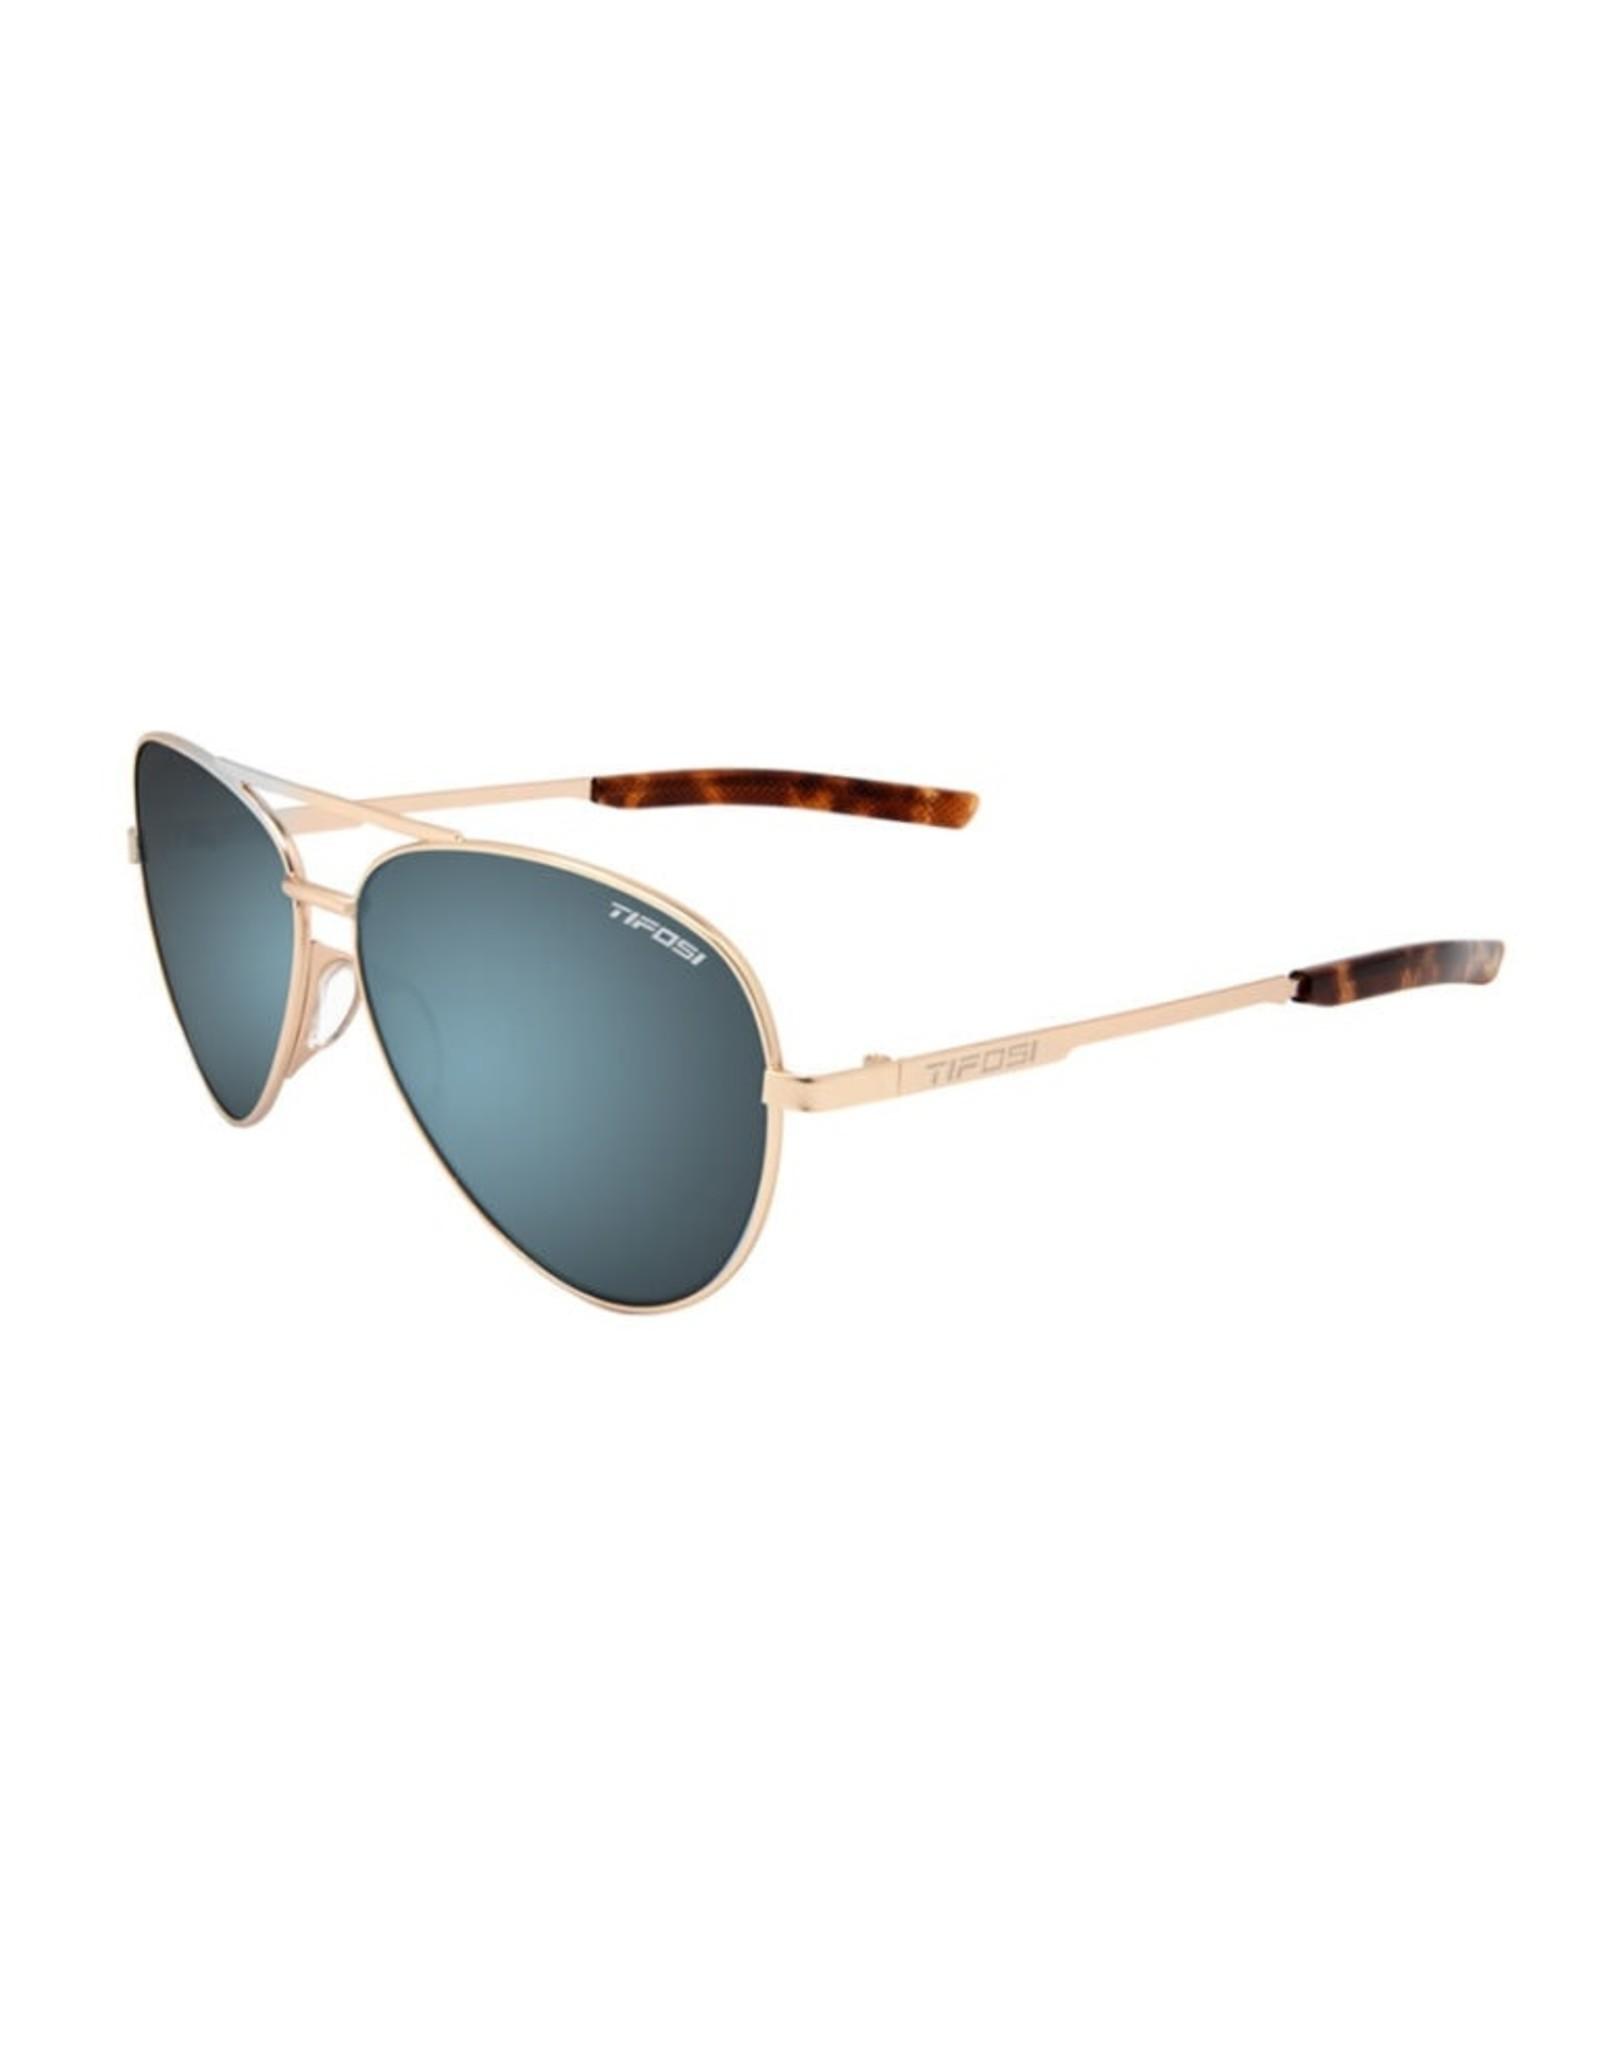 Tifosi Optics Shwae, Gold Single Lens Sunglasses - Smoke Bright Blue